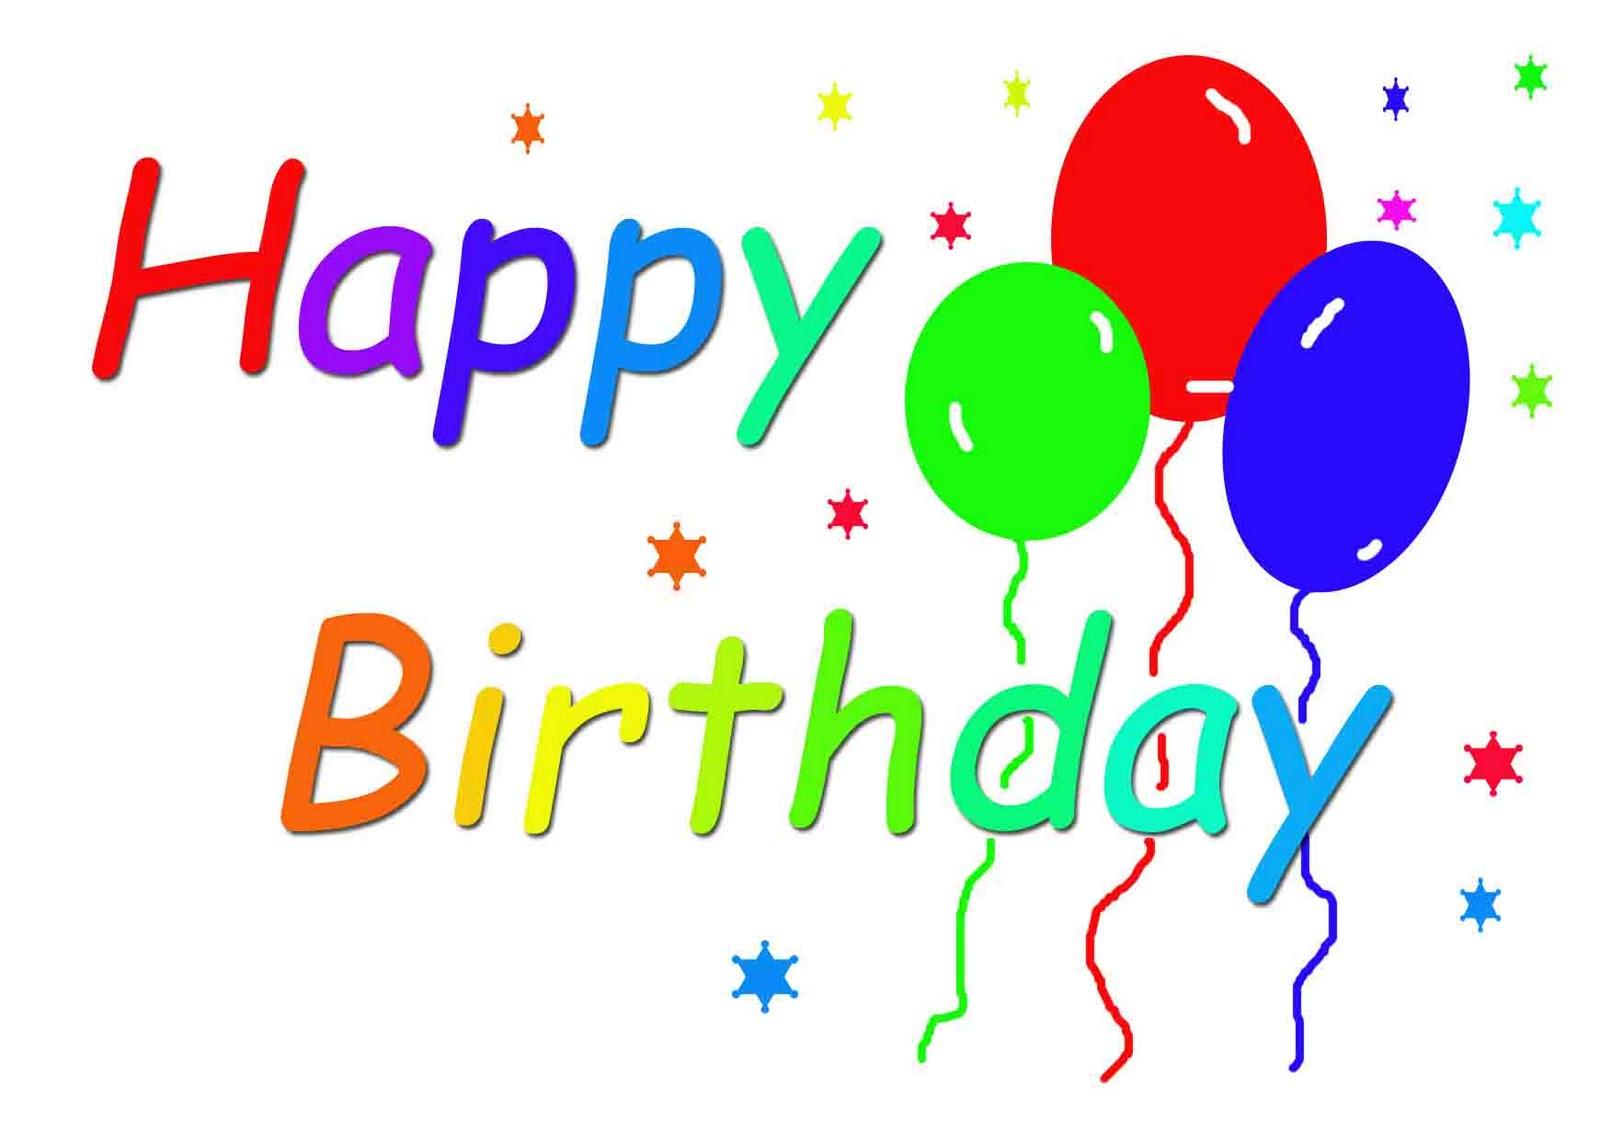 Doodle Kreations: Free Printable - Birthday Card - Free Printable Birthday Cards For Him